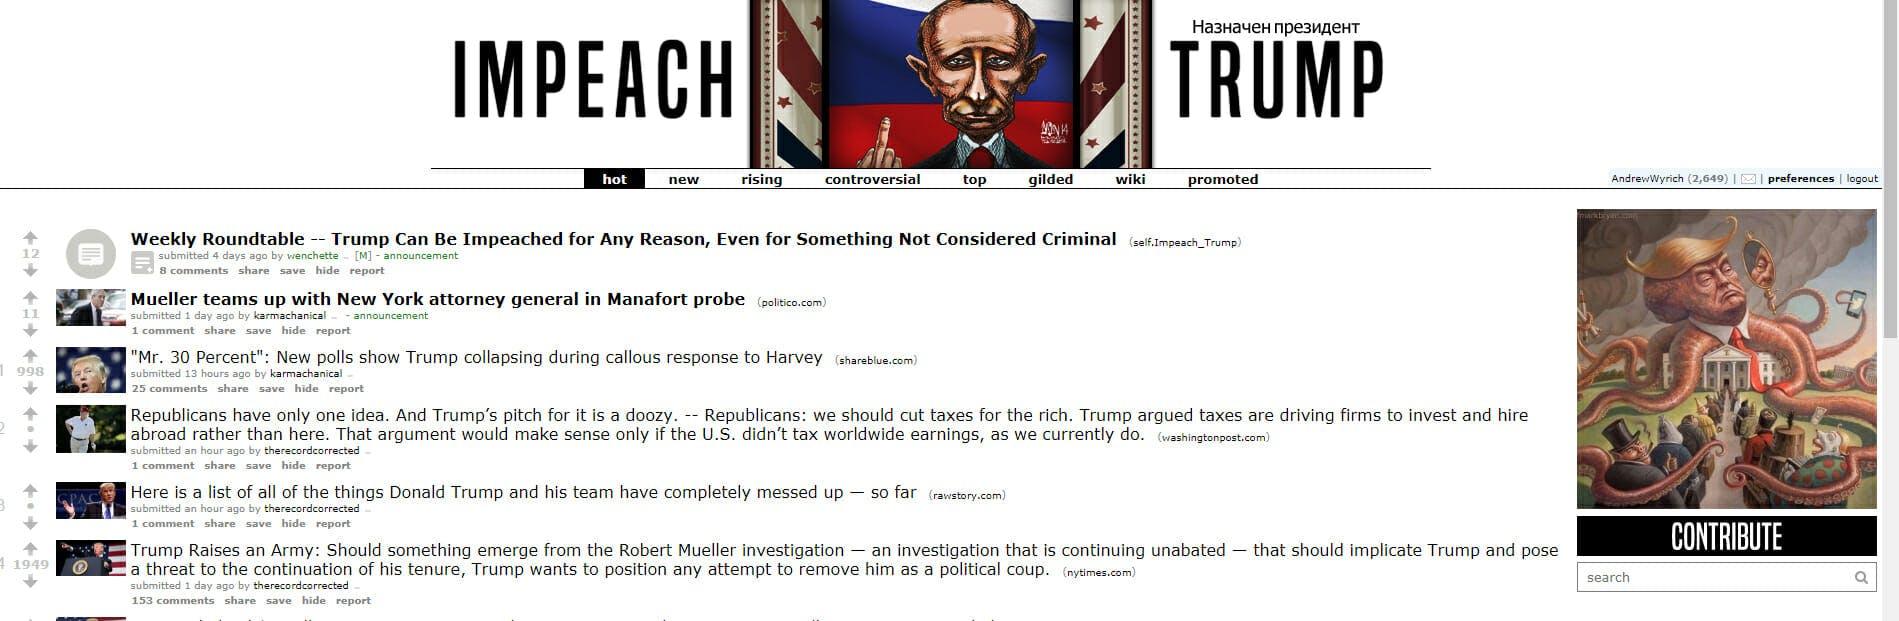 r/impeach_trump is a good subreddit for liberals.